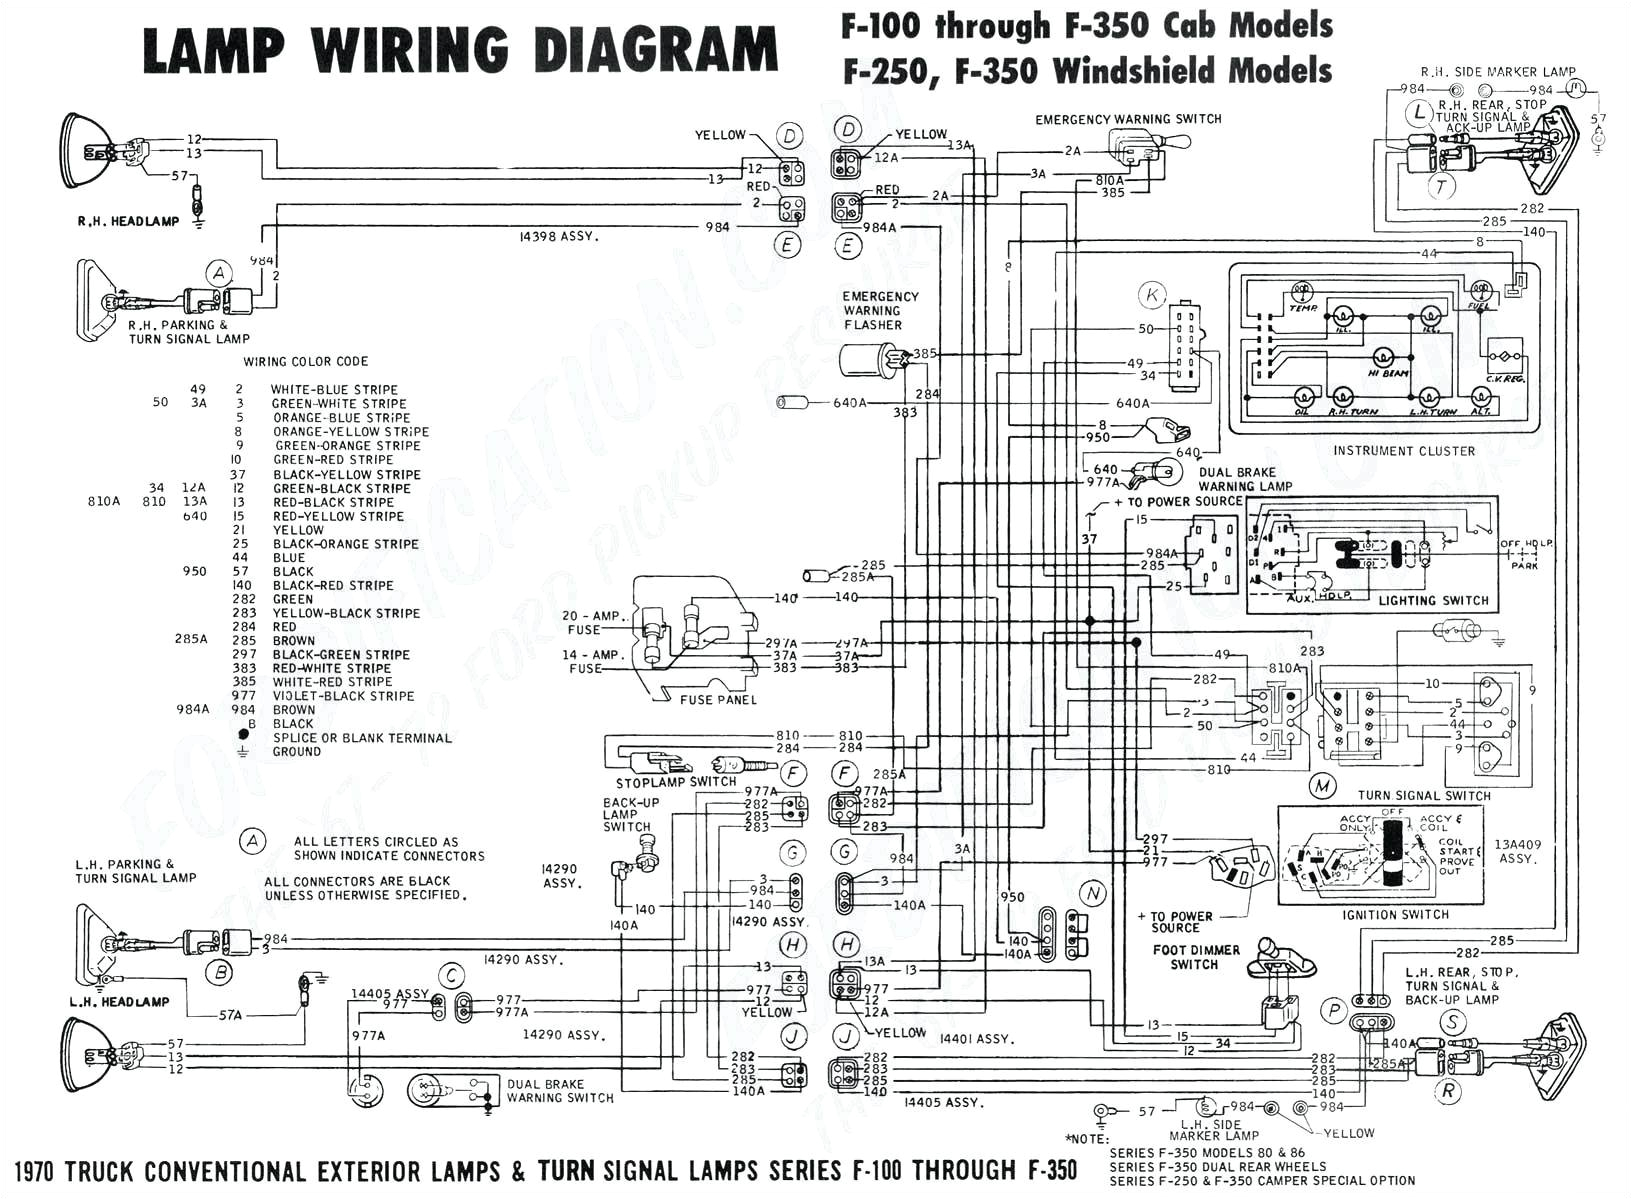 4l60e Wiring Diagram 1995 4l60e Wiring Diagram Wiring Diagram Datasource